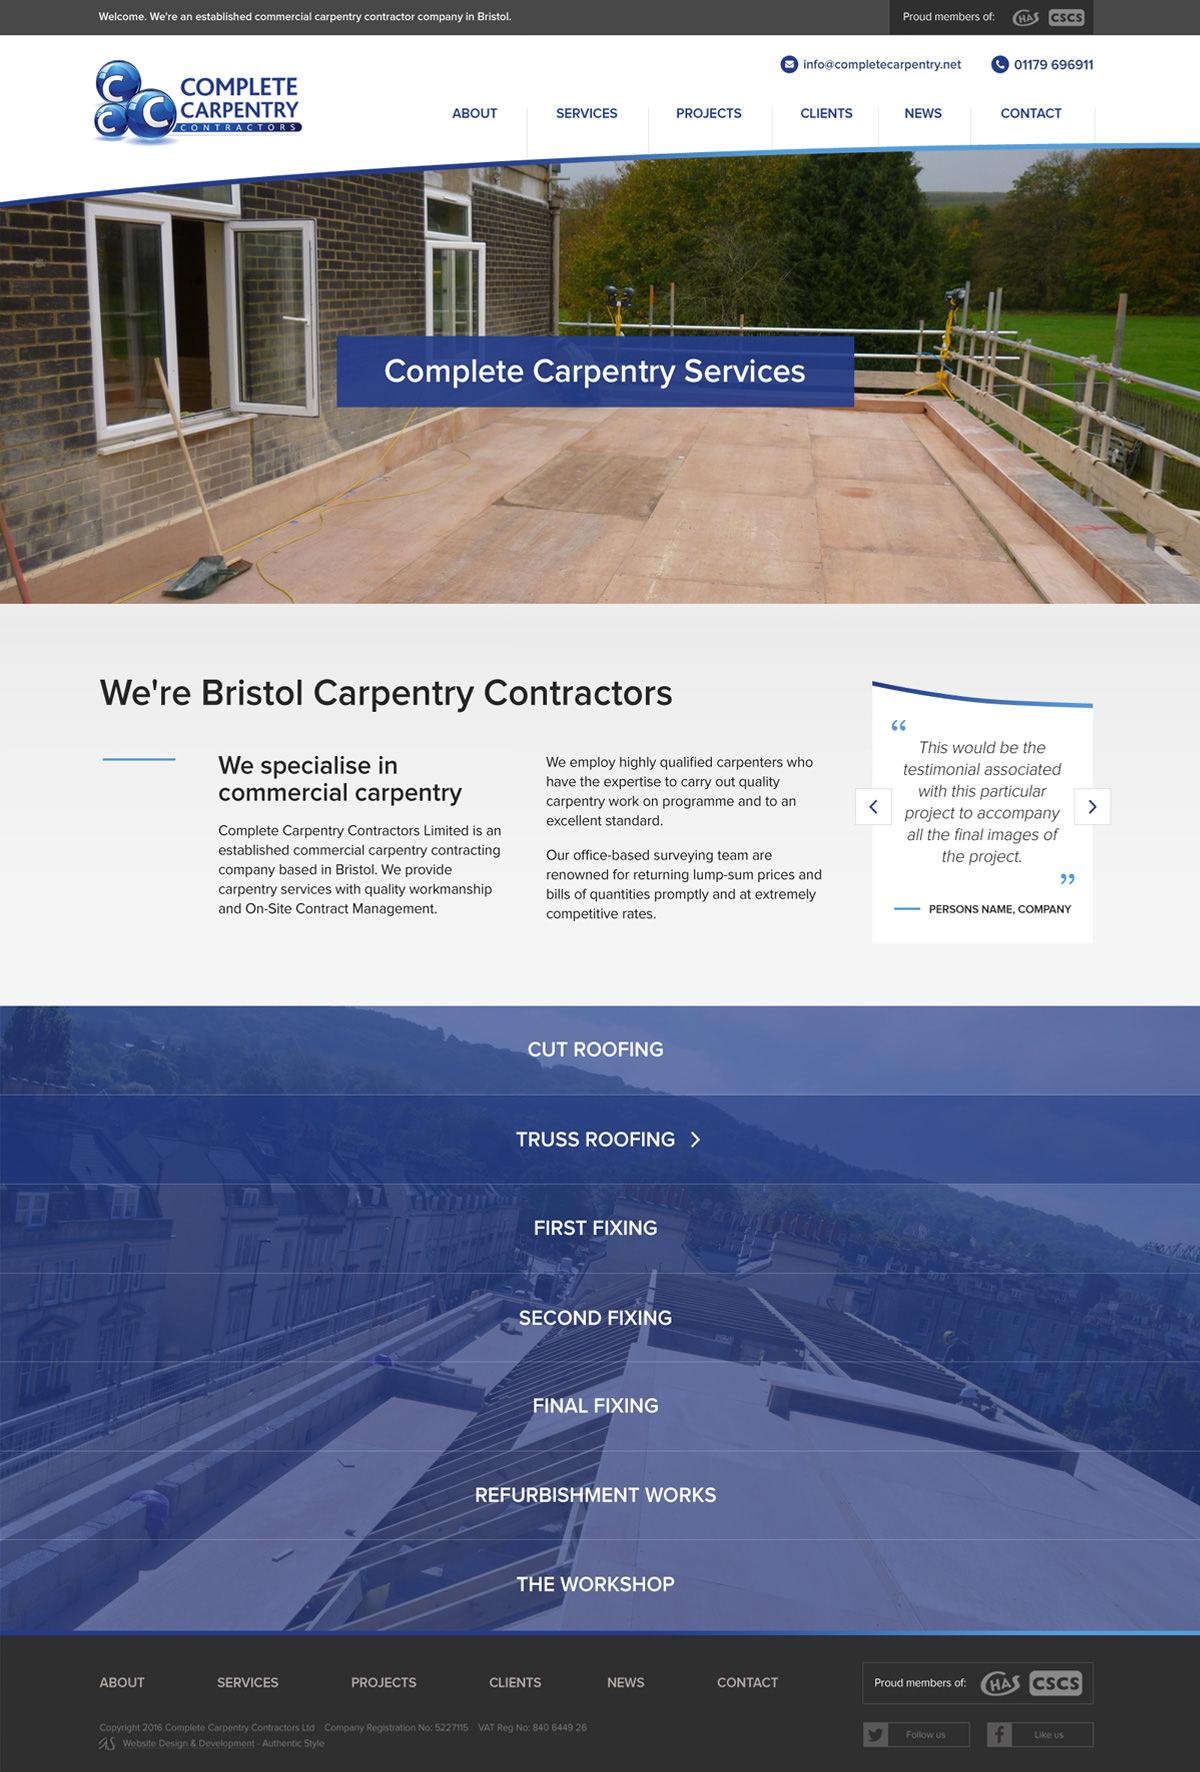 carpentry-contracors-bristol-services